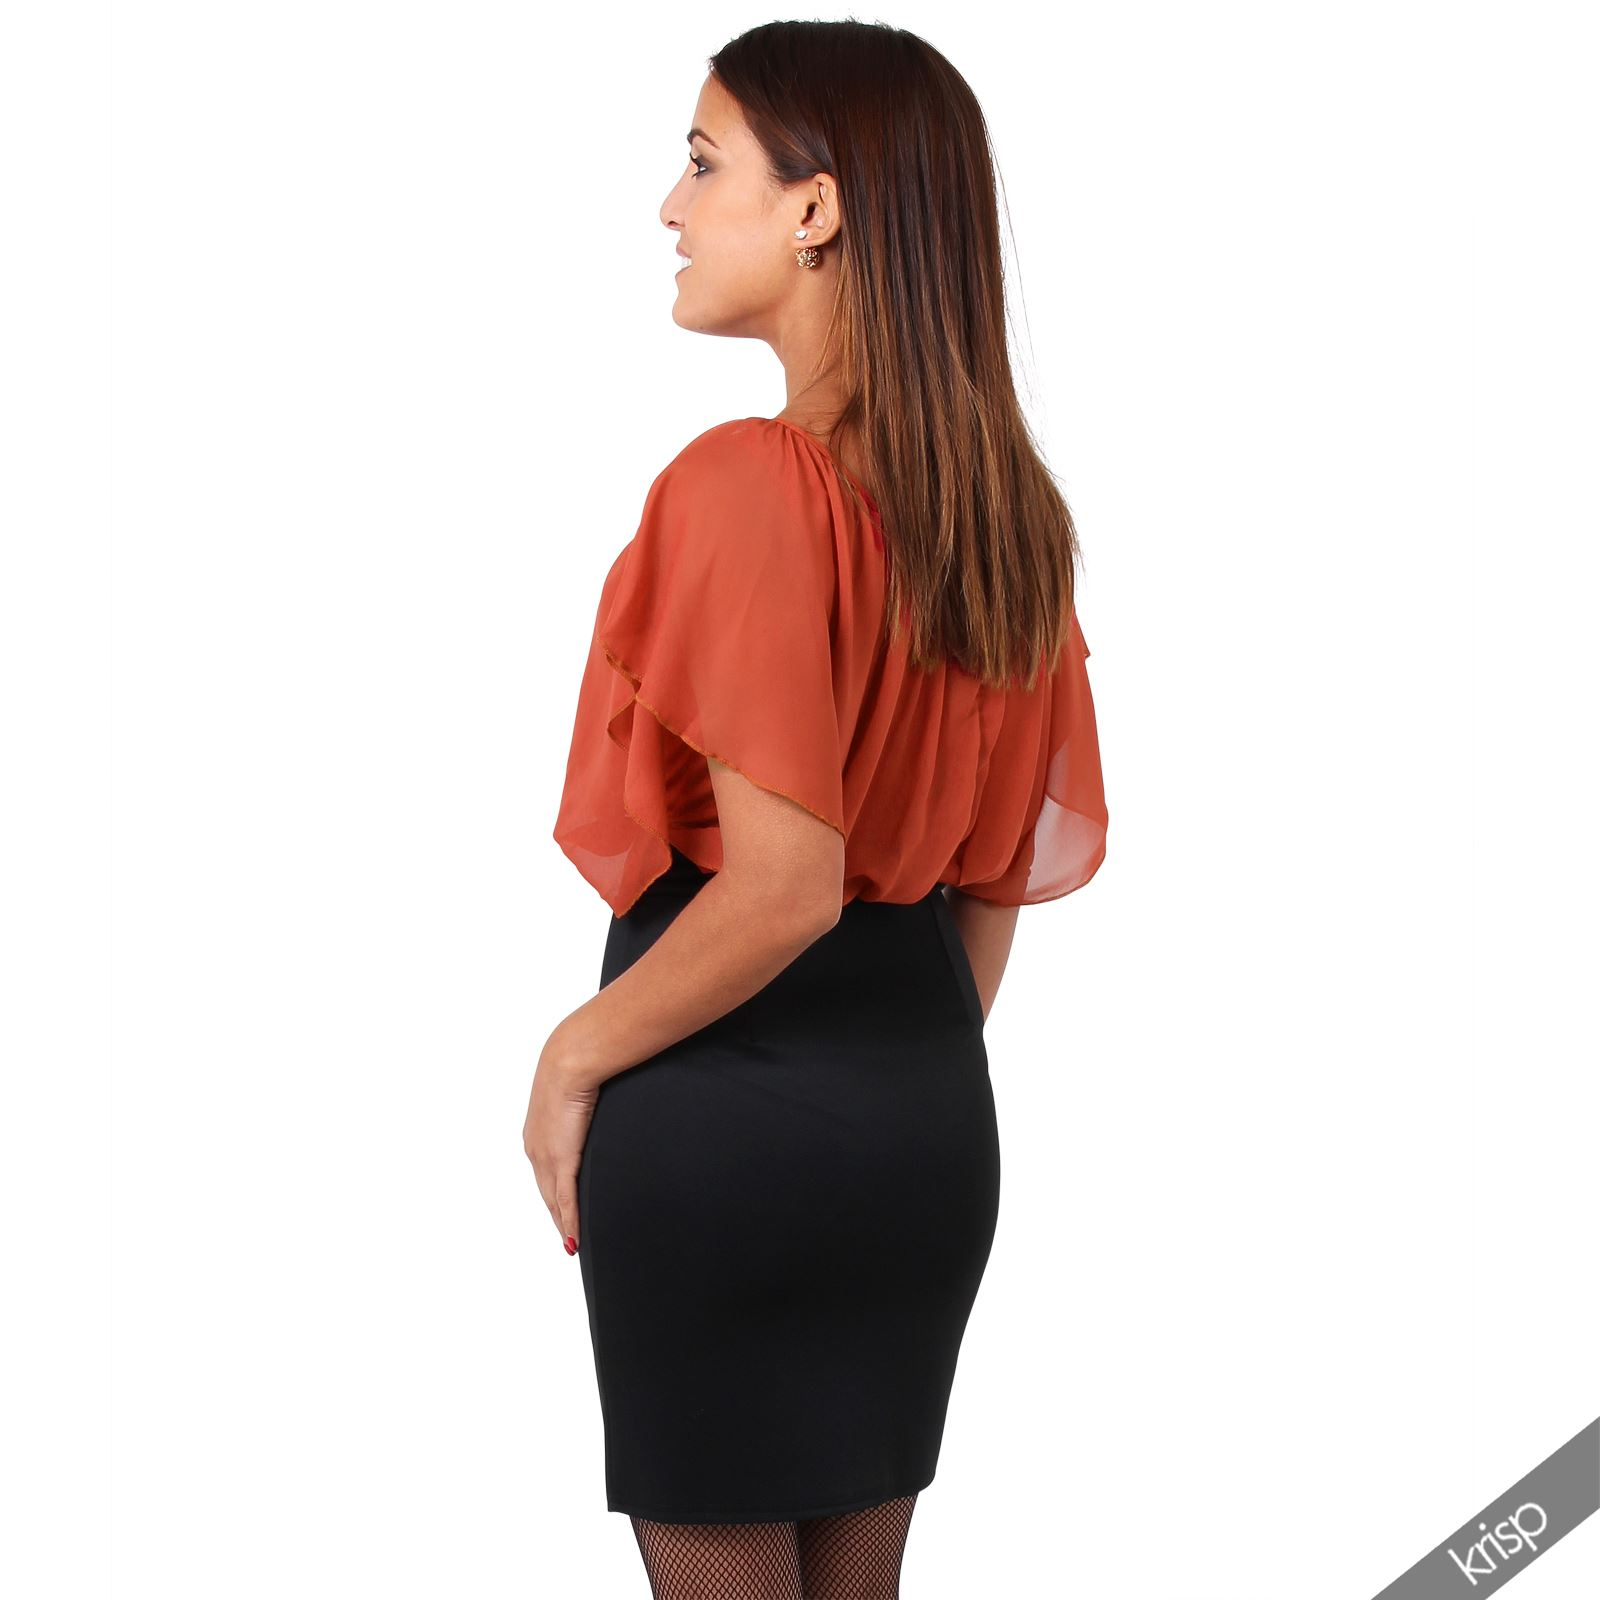 Womens-Pleated-Chiffon-Batwing-Top-High-Waist-Pencil-Bodycon-Skirt-Mini-Dress thumbnail 31